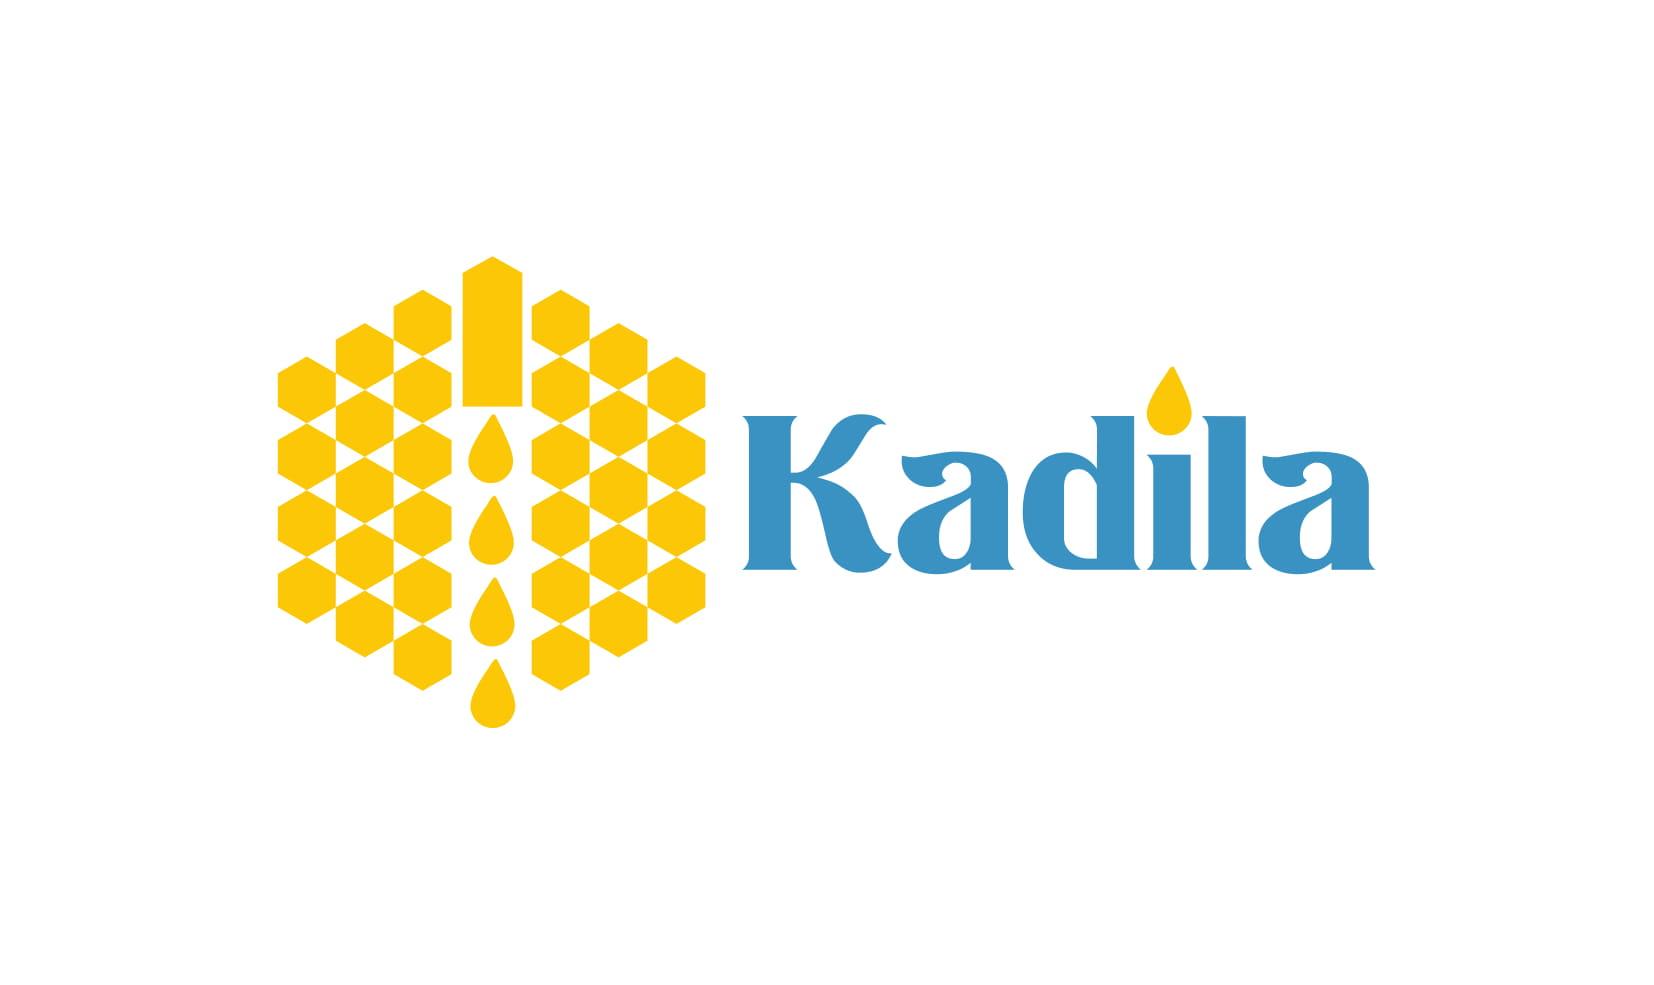 Kadila